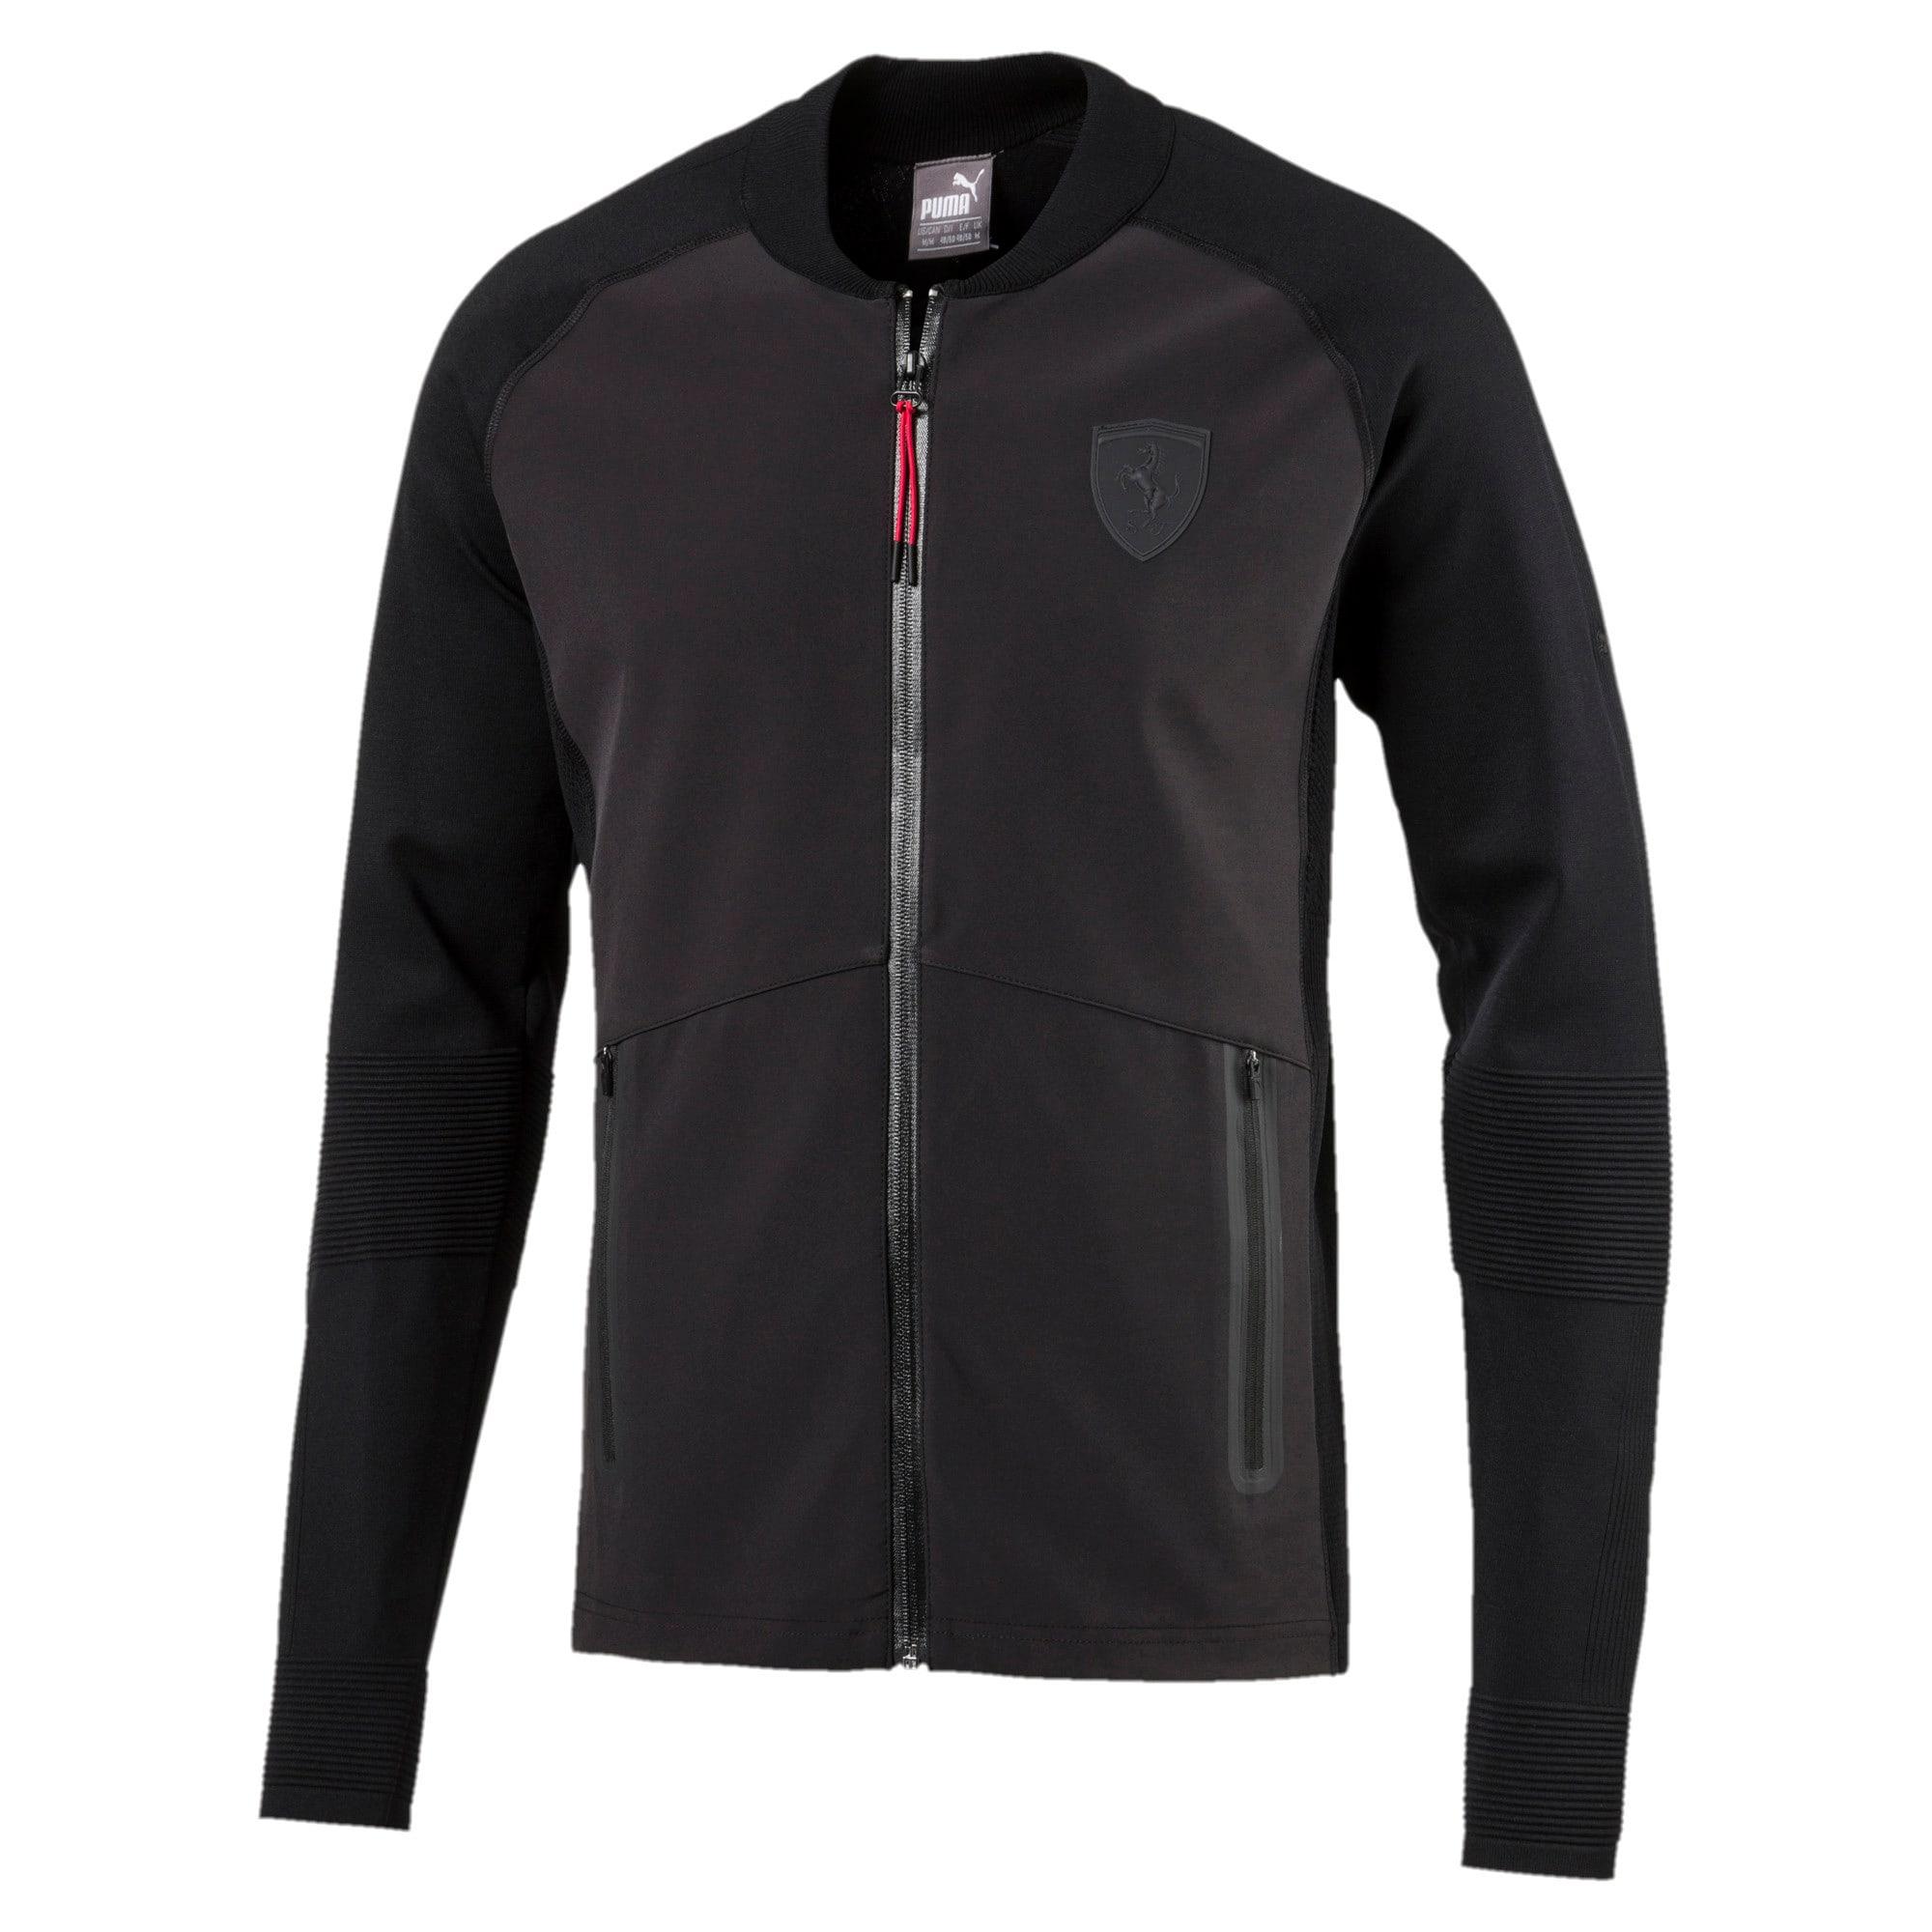 Thumbnail 5 of Ferrari Fusion Men's Jacket, Moonless Night, medium-IND